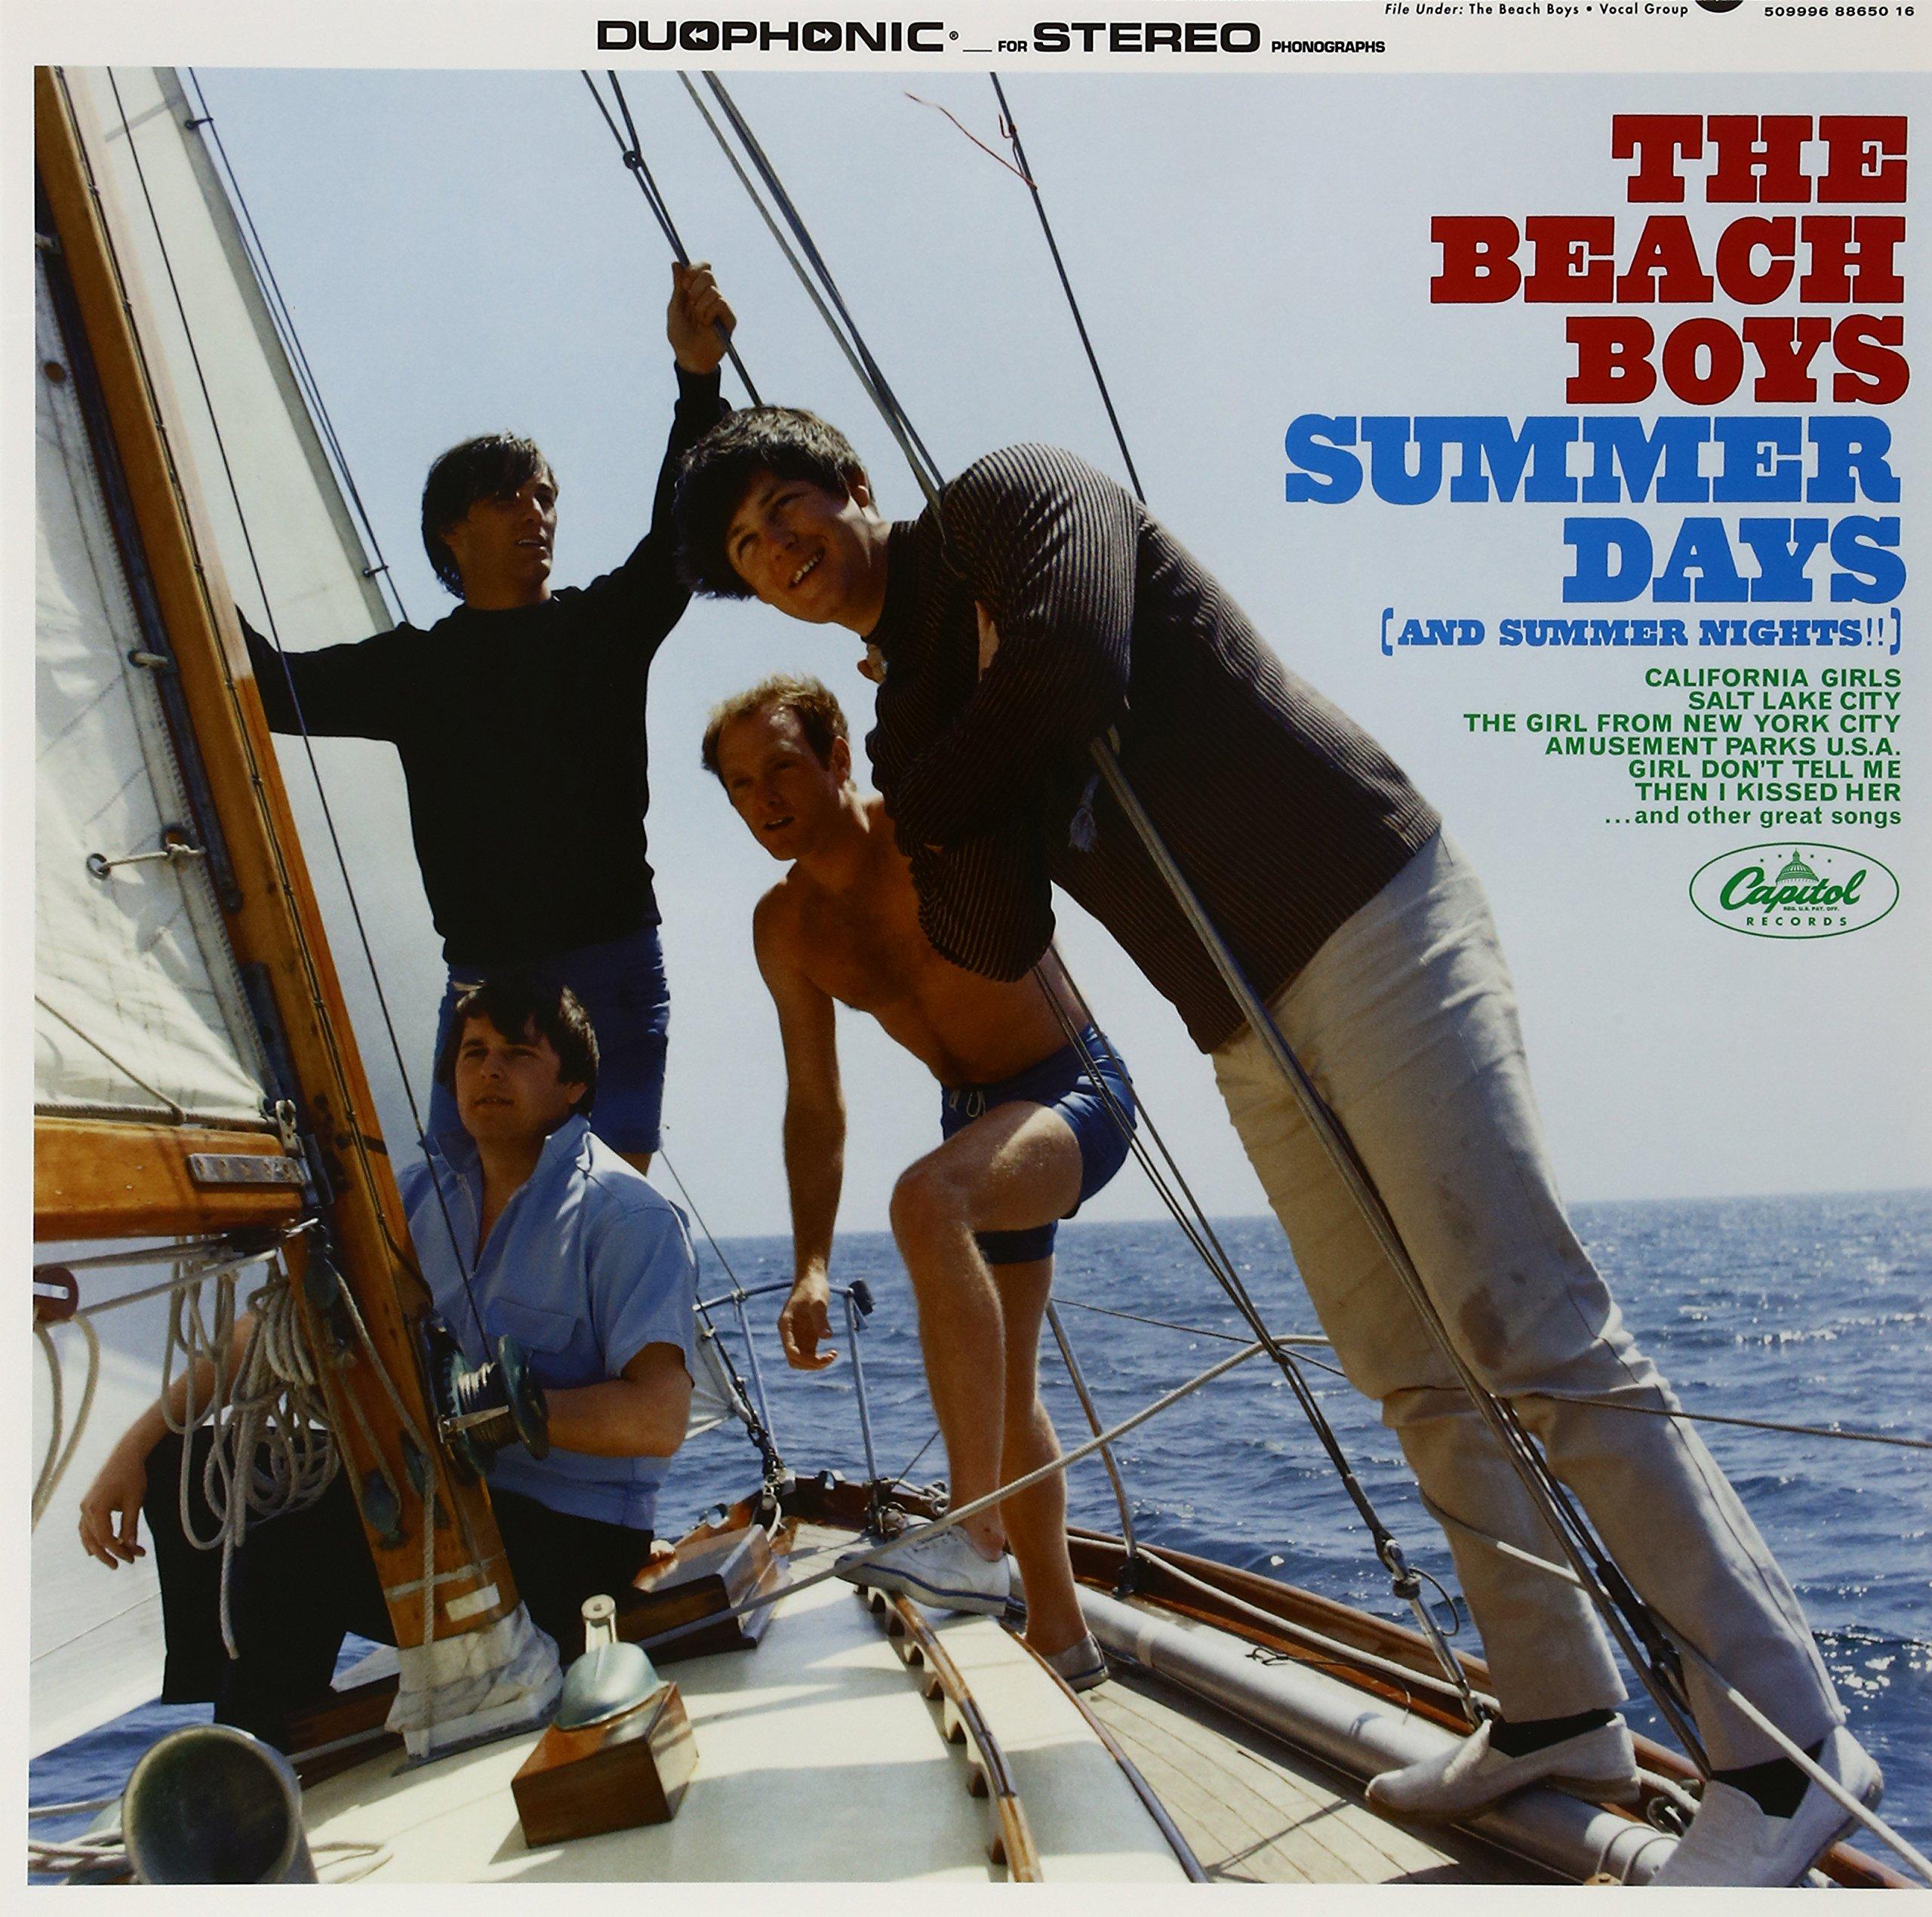 Summer Days (And Summer Nights!!) [Vinyl] by VINYL